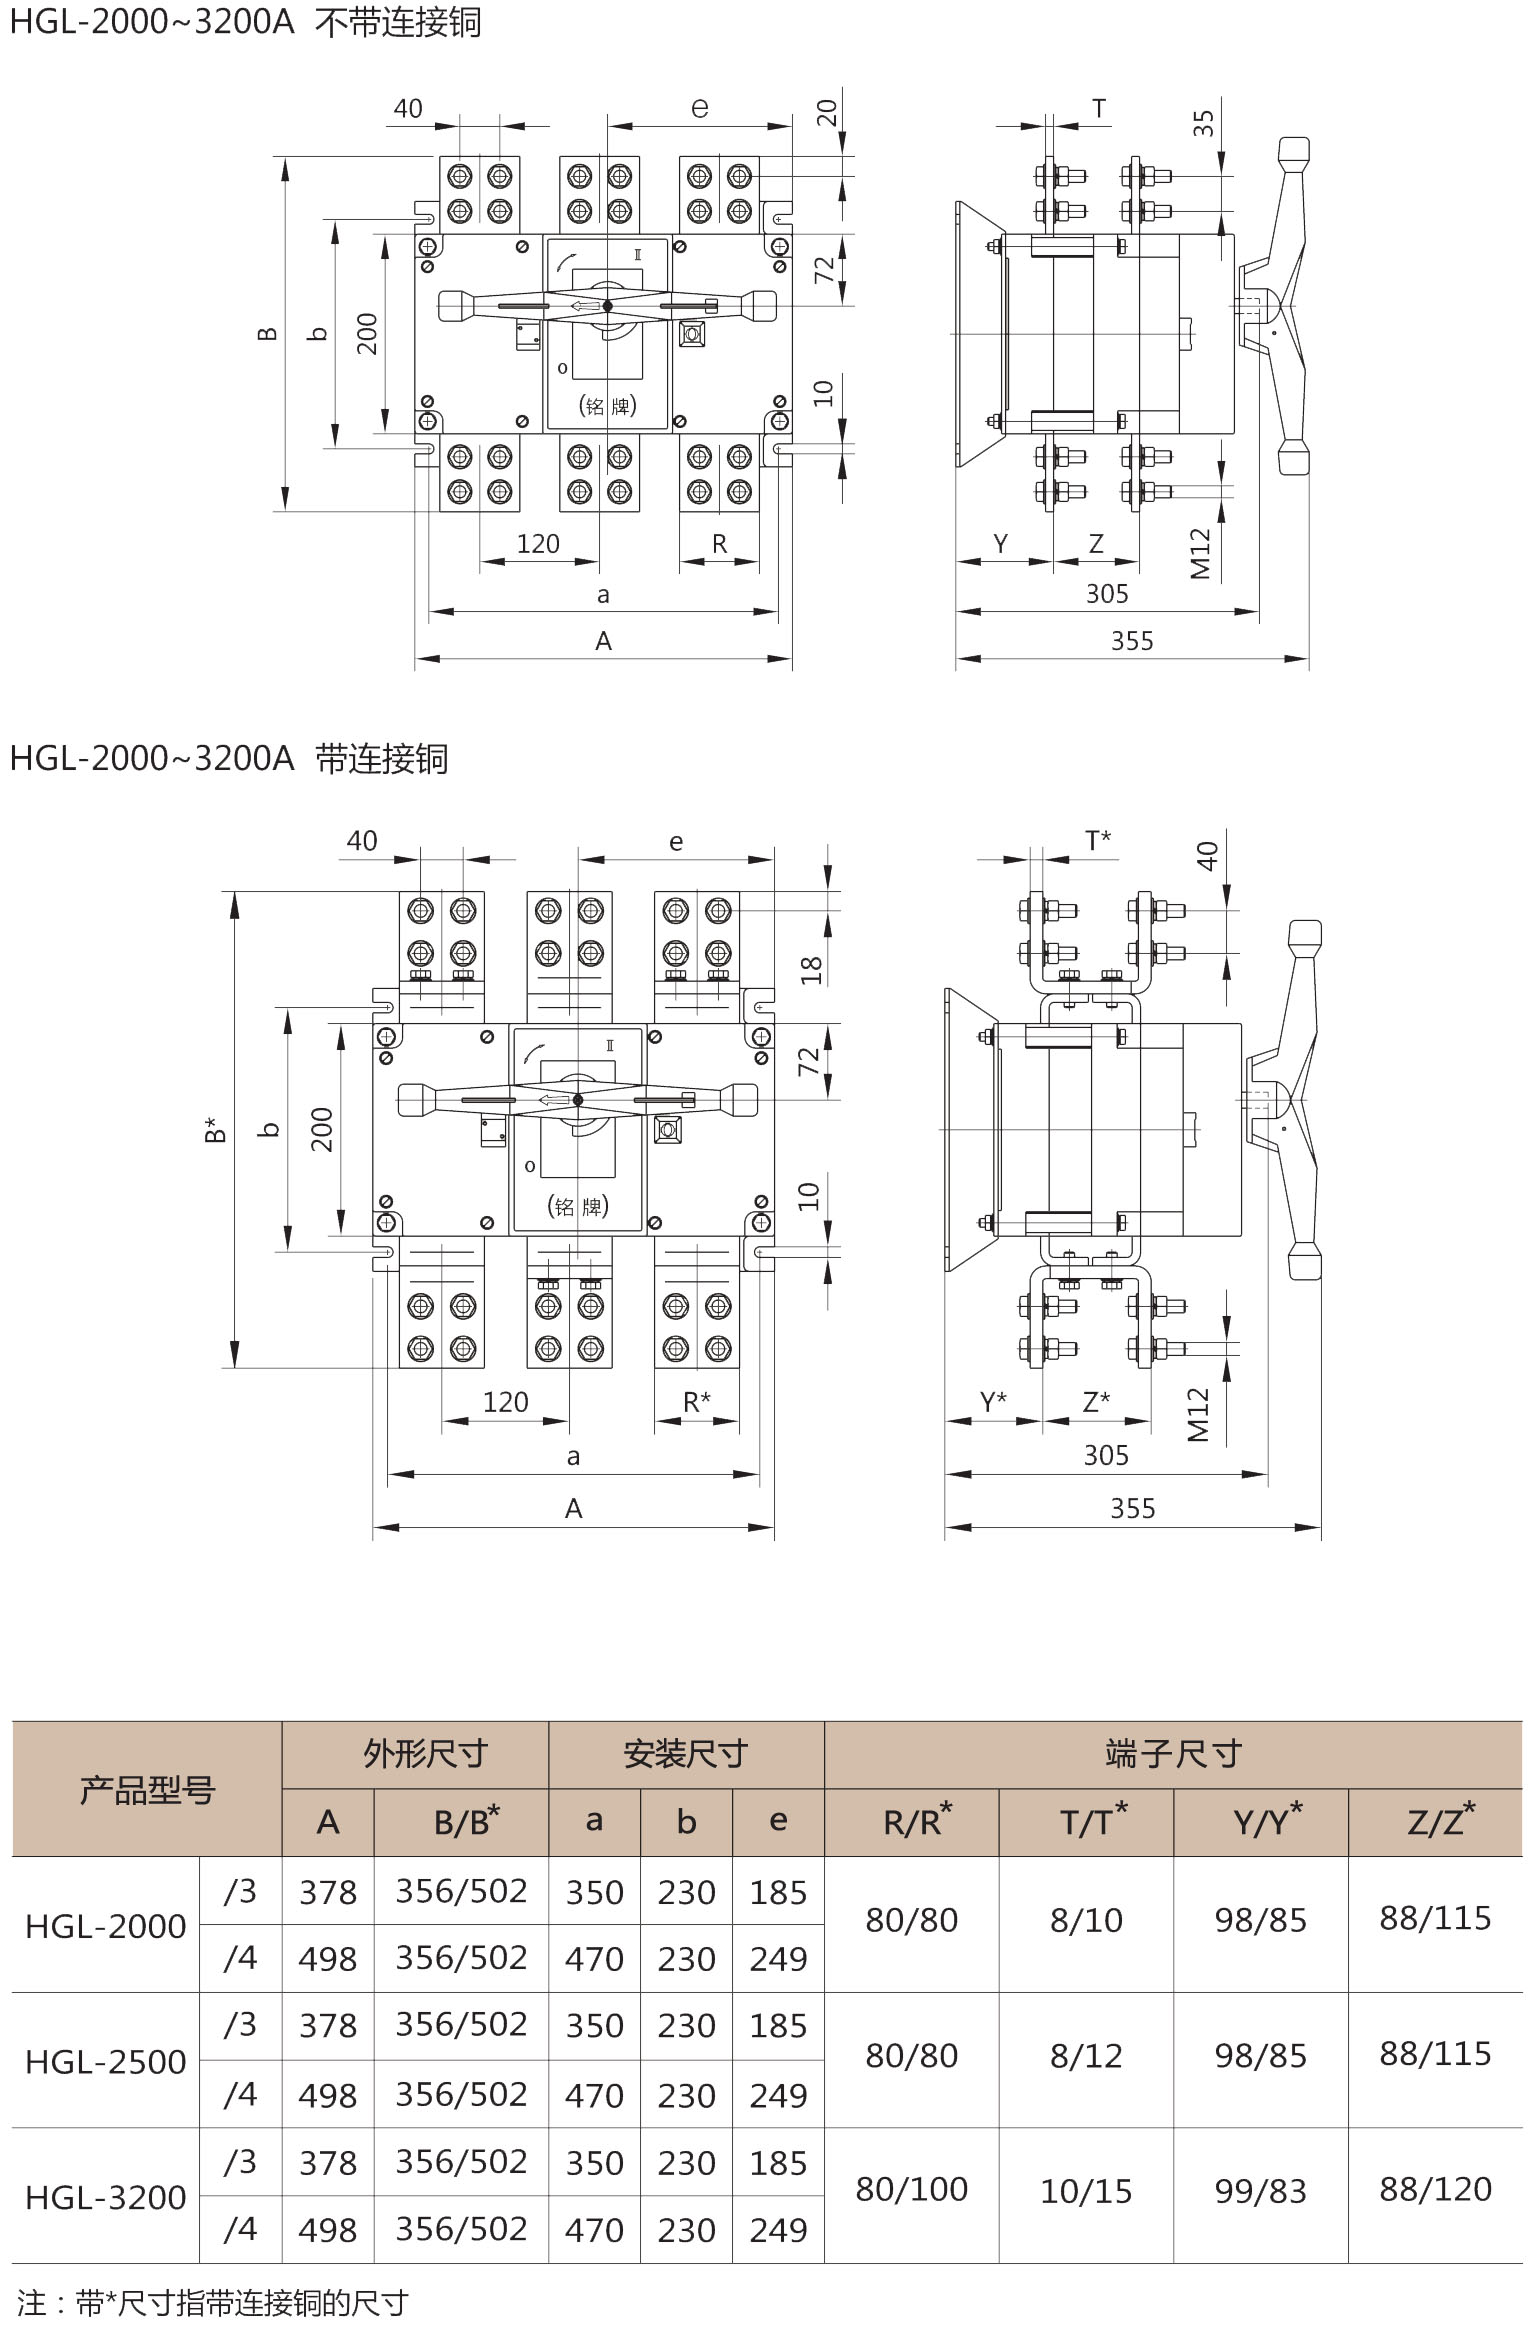 HGL-2000~3200A外形安装尺寸